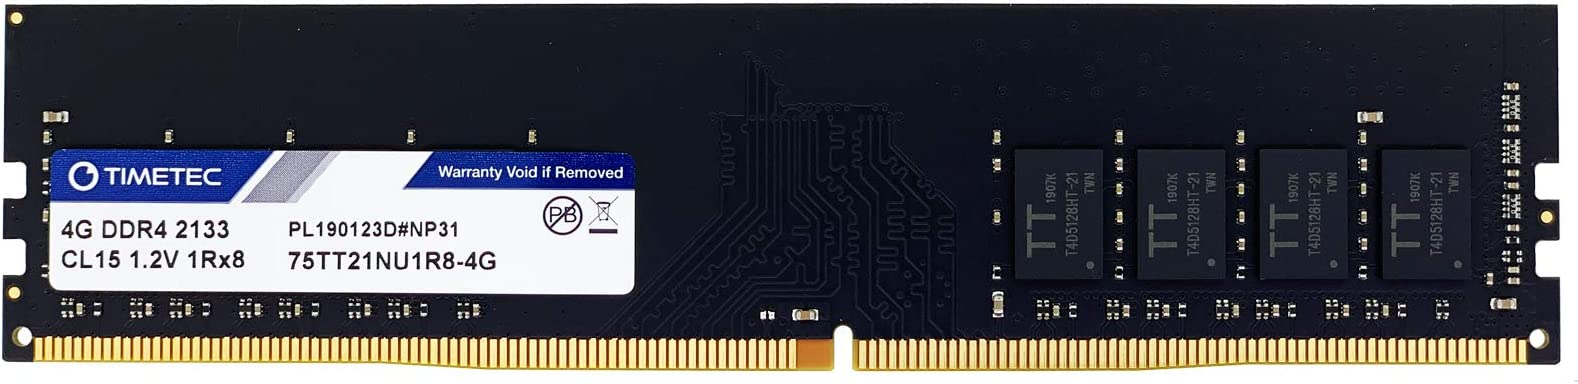 PC4-2133 - Motherboard Memory Upgrade 16GB RAM Memory Asus Z170 Pro Gaming DDR4-17000 - Non-ECC